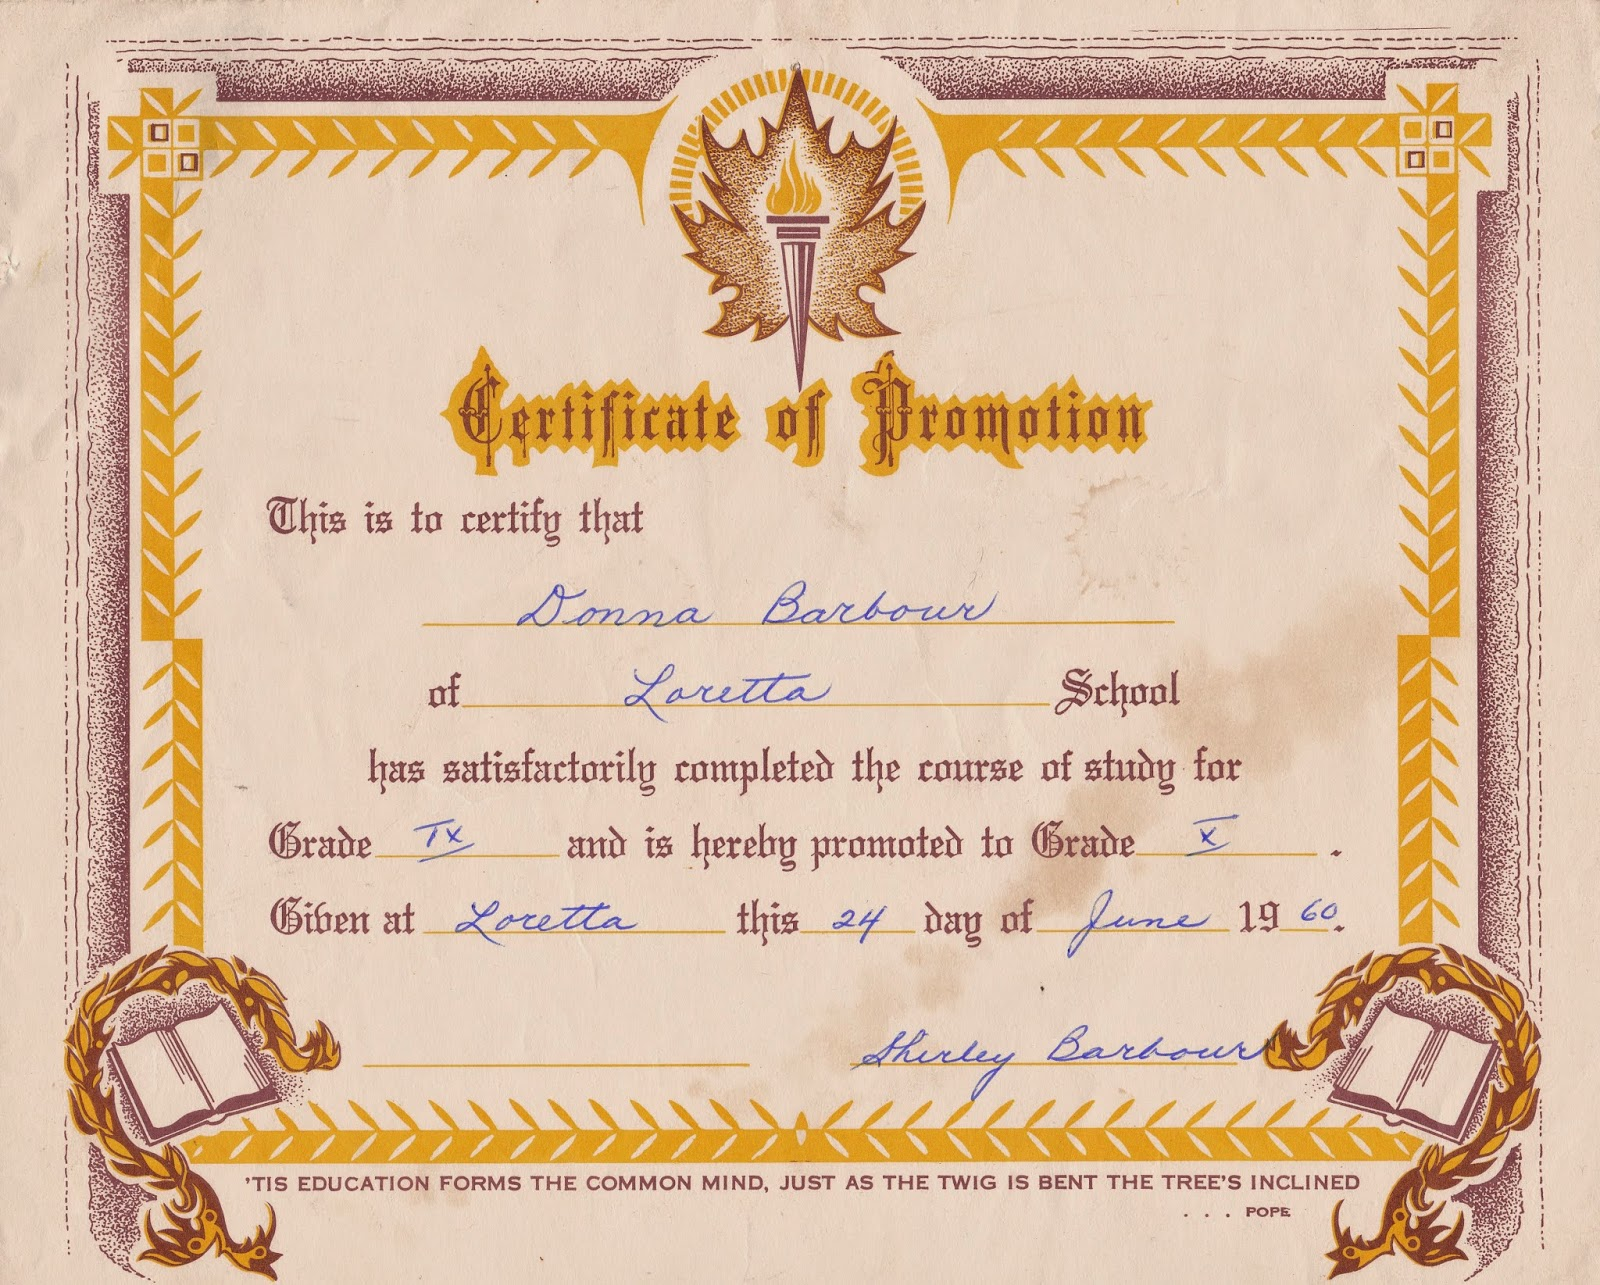 History Of Alma Lauretta Lauretta School Certificate Of Promotion